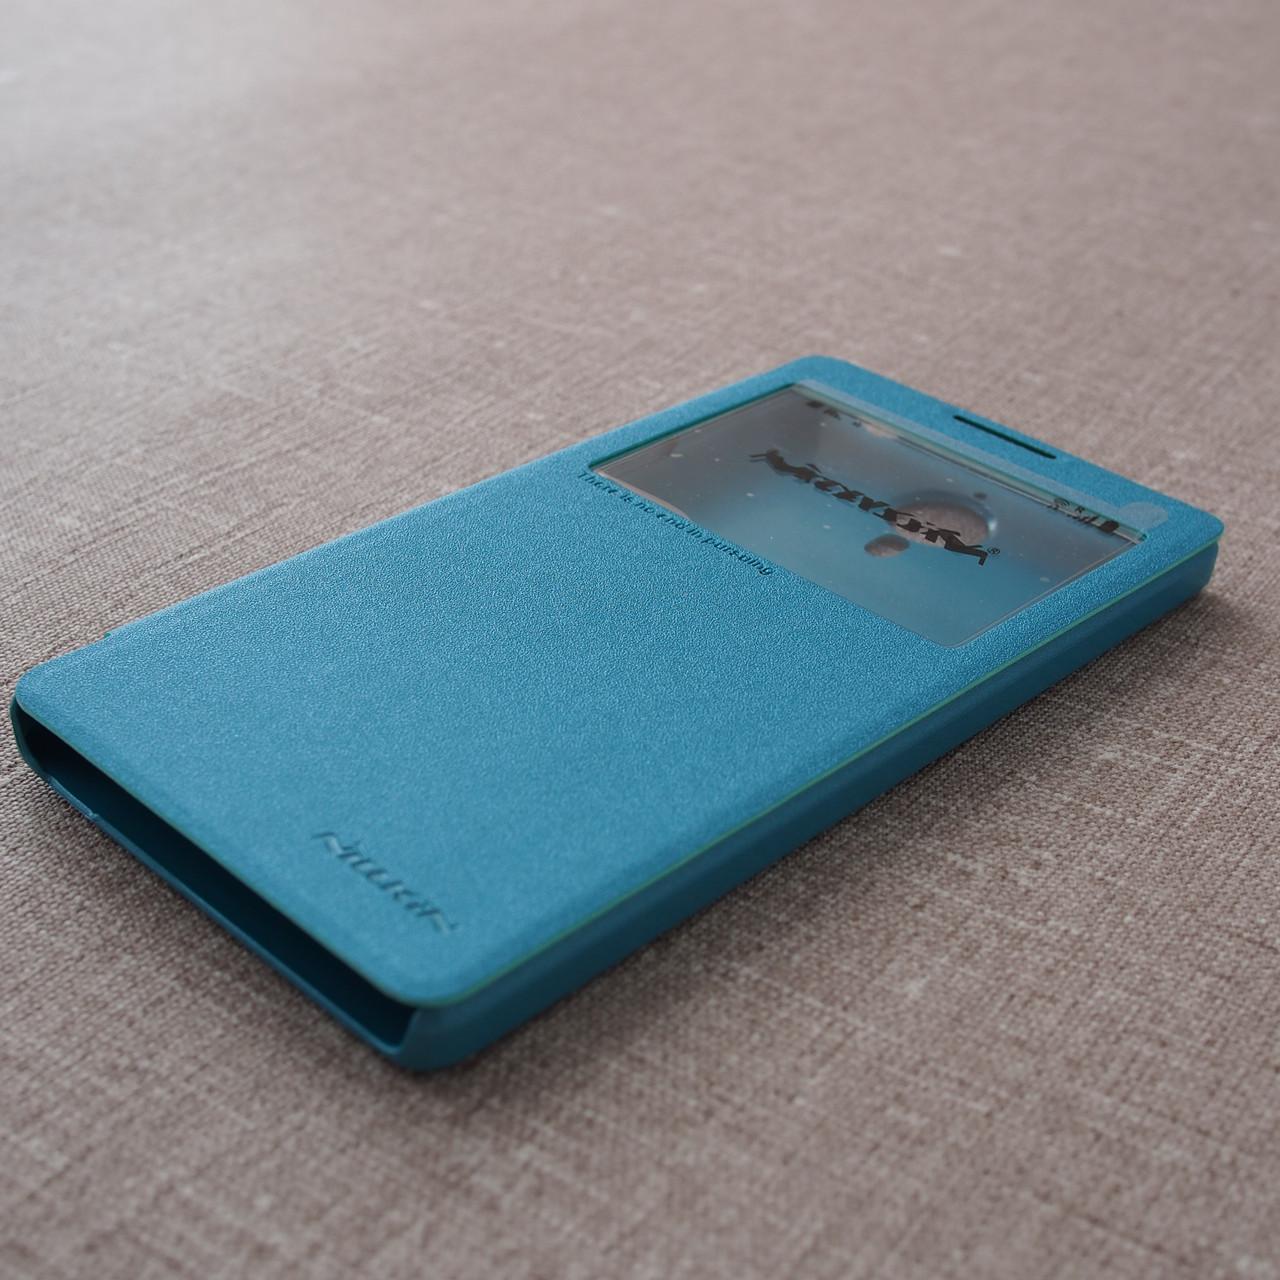 Чехлы для других смартфонов Nillkin Sparkle Lenovo P90 K80 turquoise